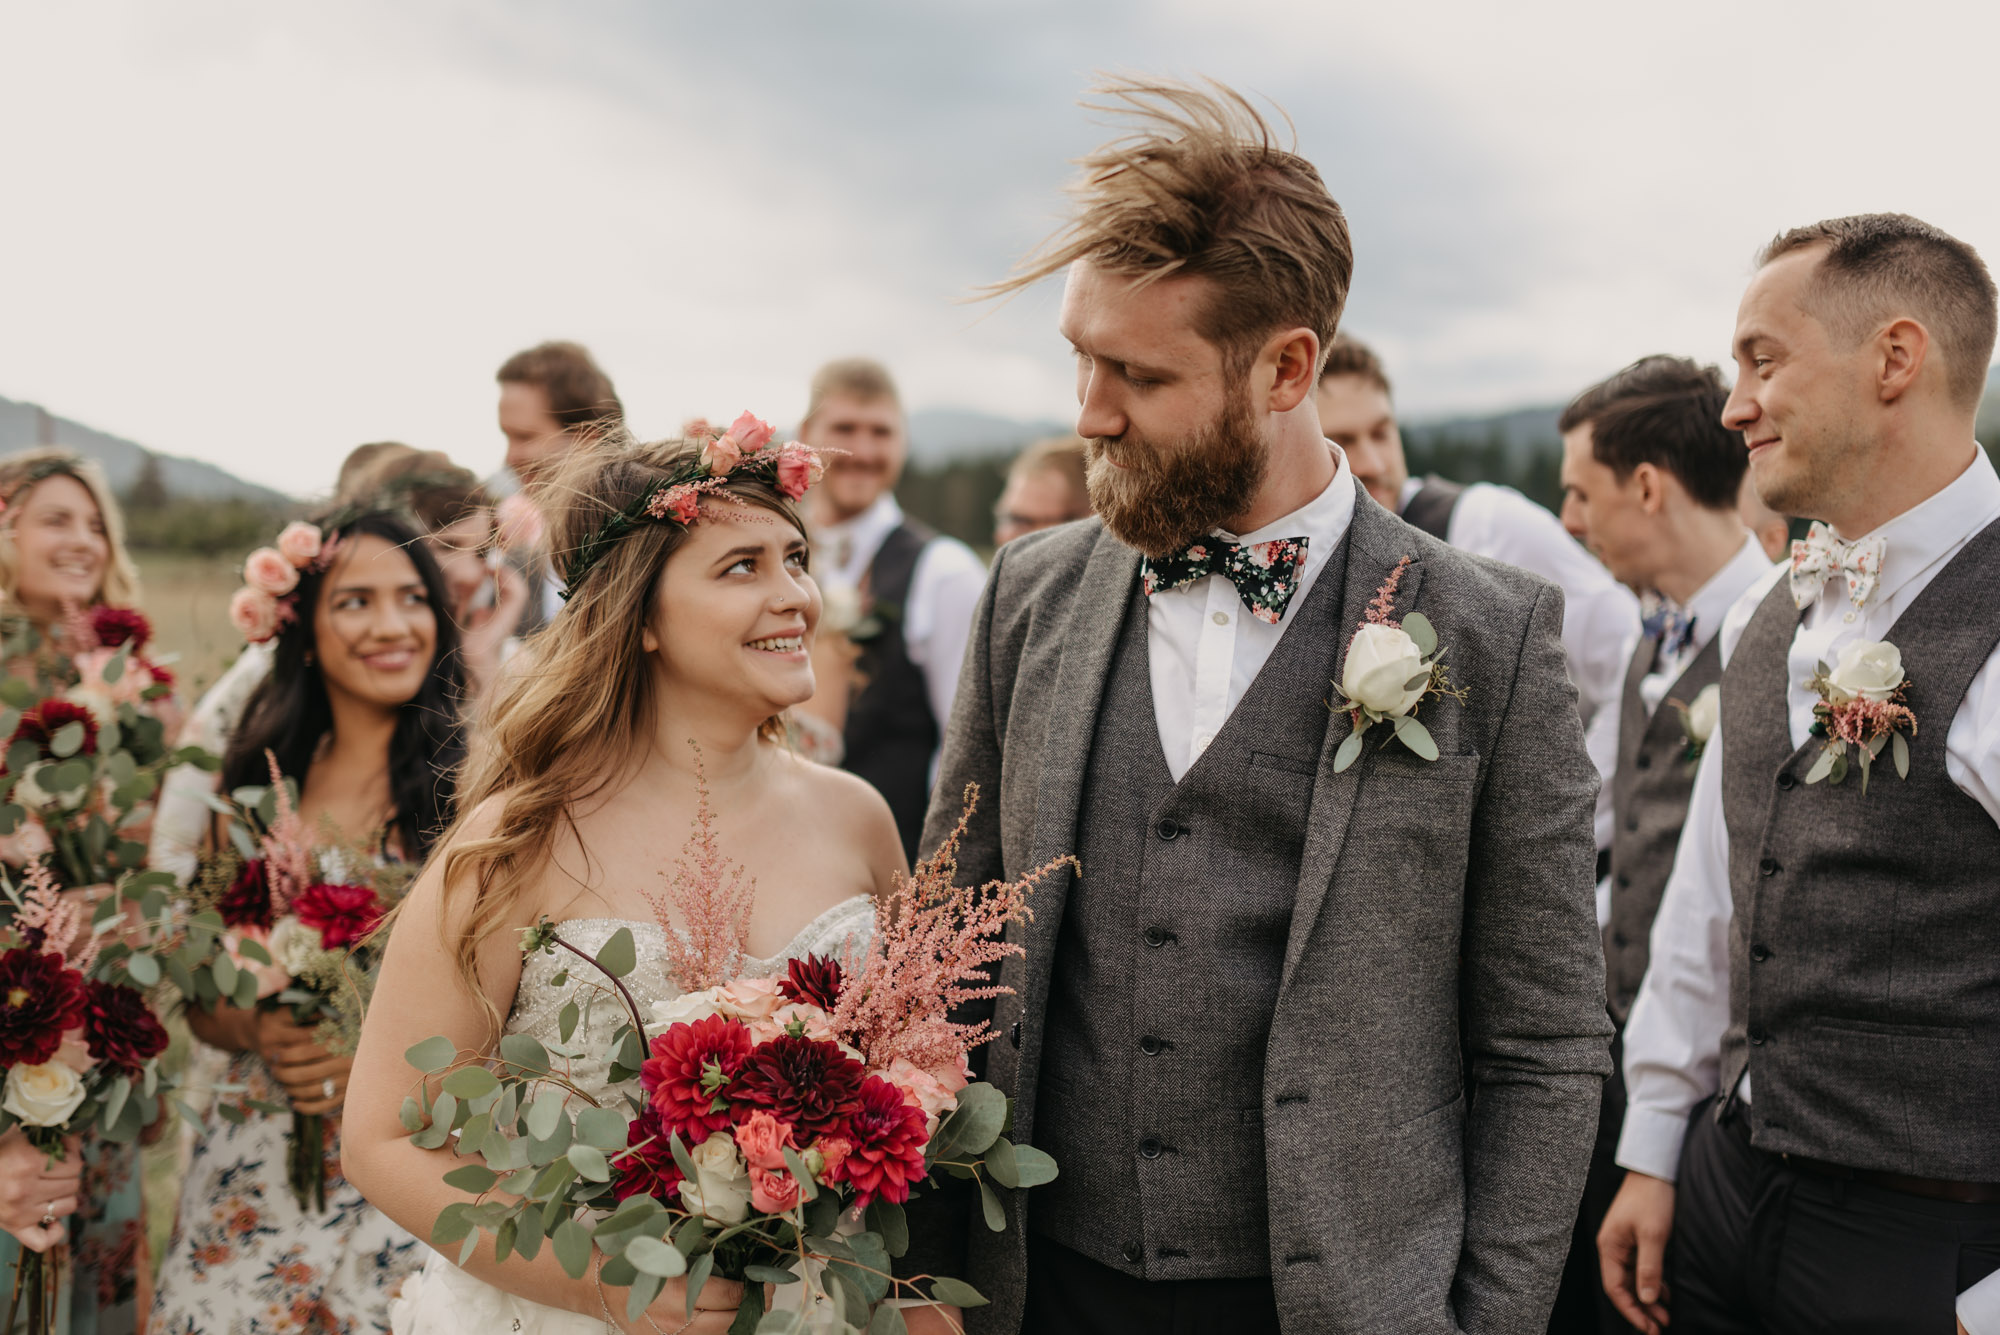 Bridal-Party-Free-People-Flower-Dresses-Washington-Wedding-8659.jpg